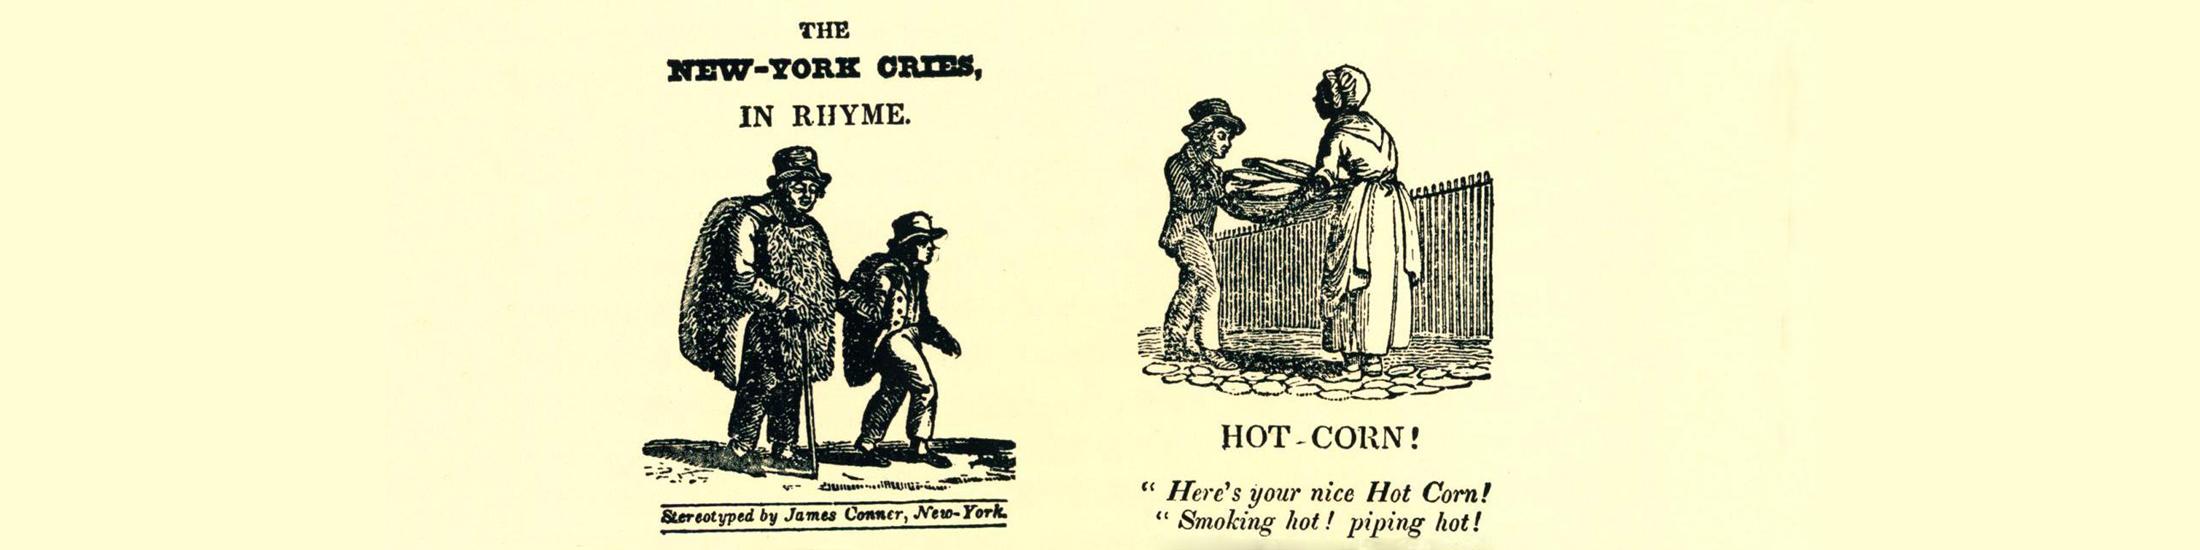 Cartoons of peddlers and sales people